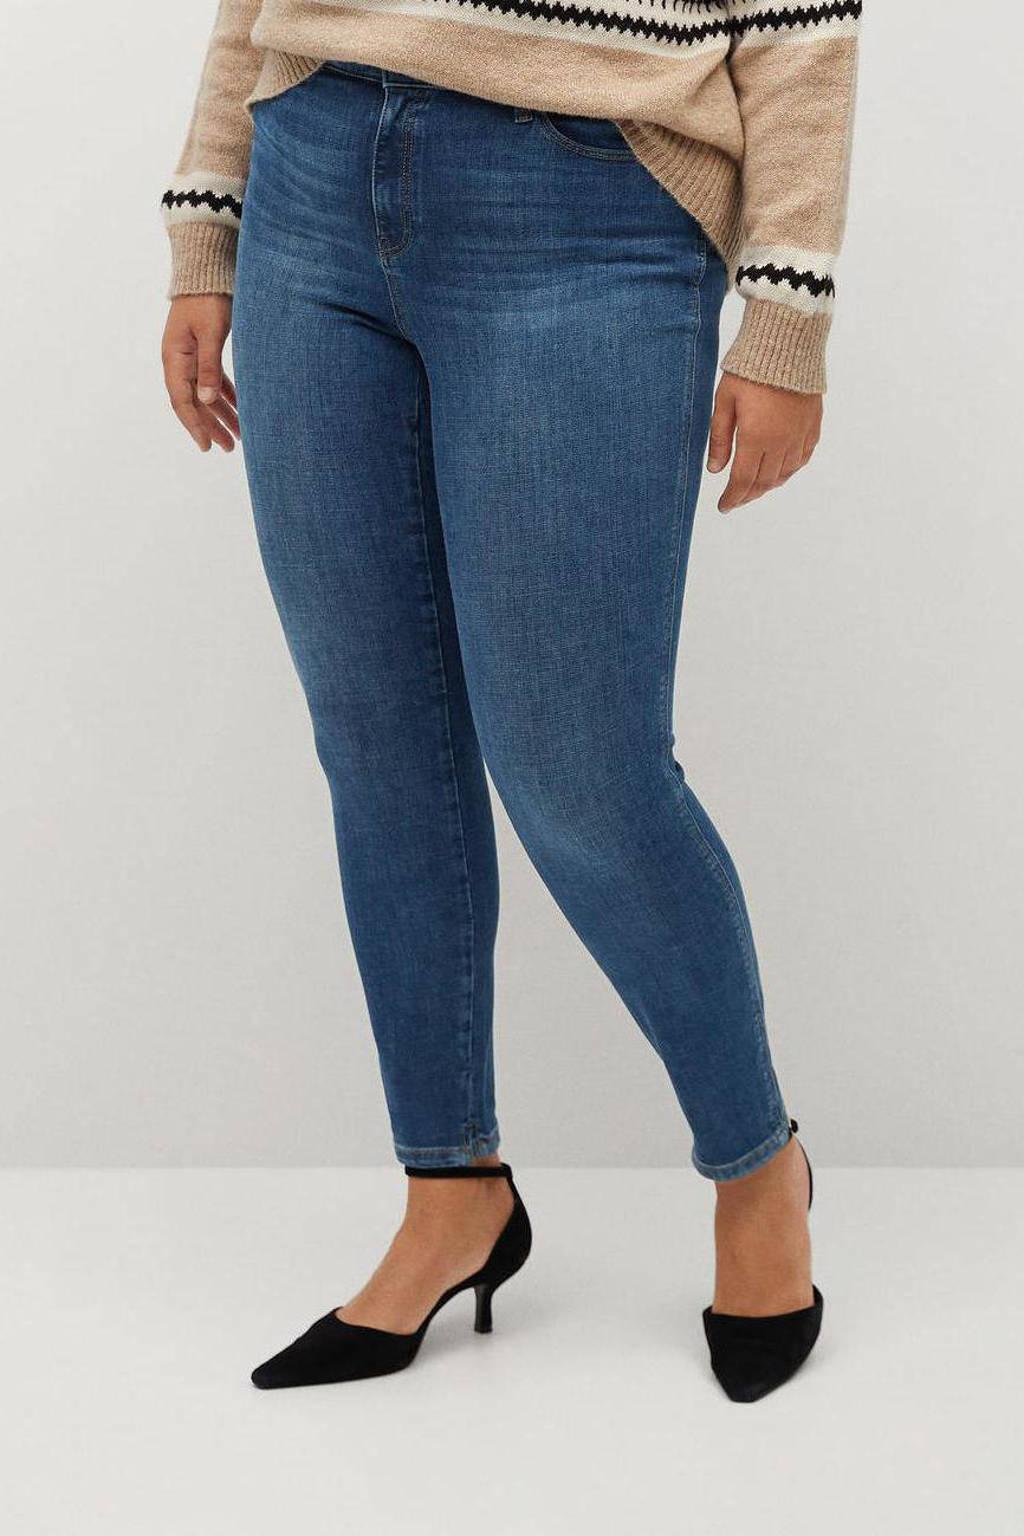 Violeta by Mango push-up skinny jeans Irene Bi-stretch blue